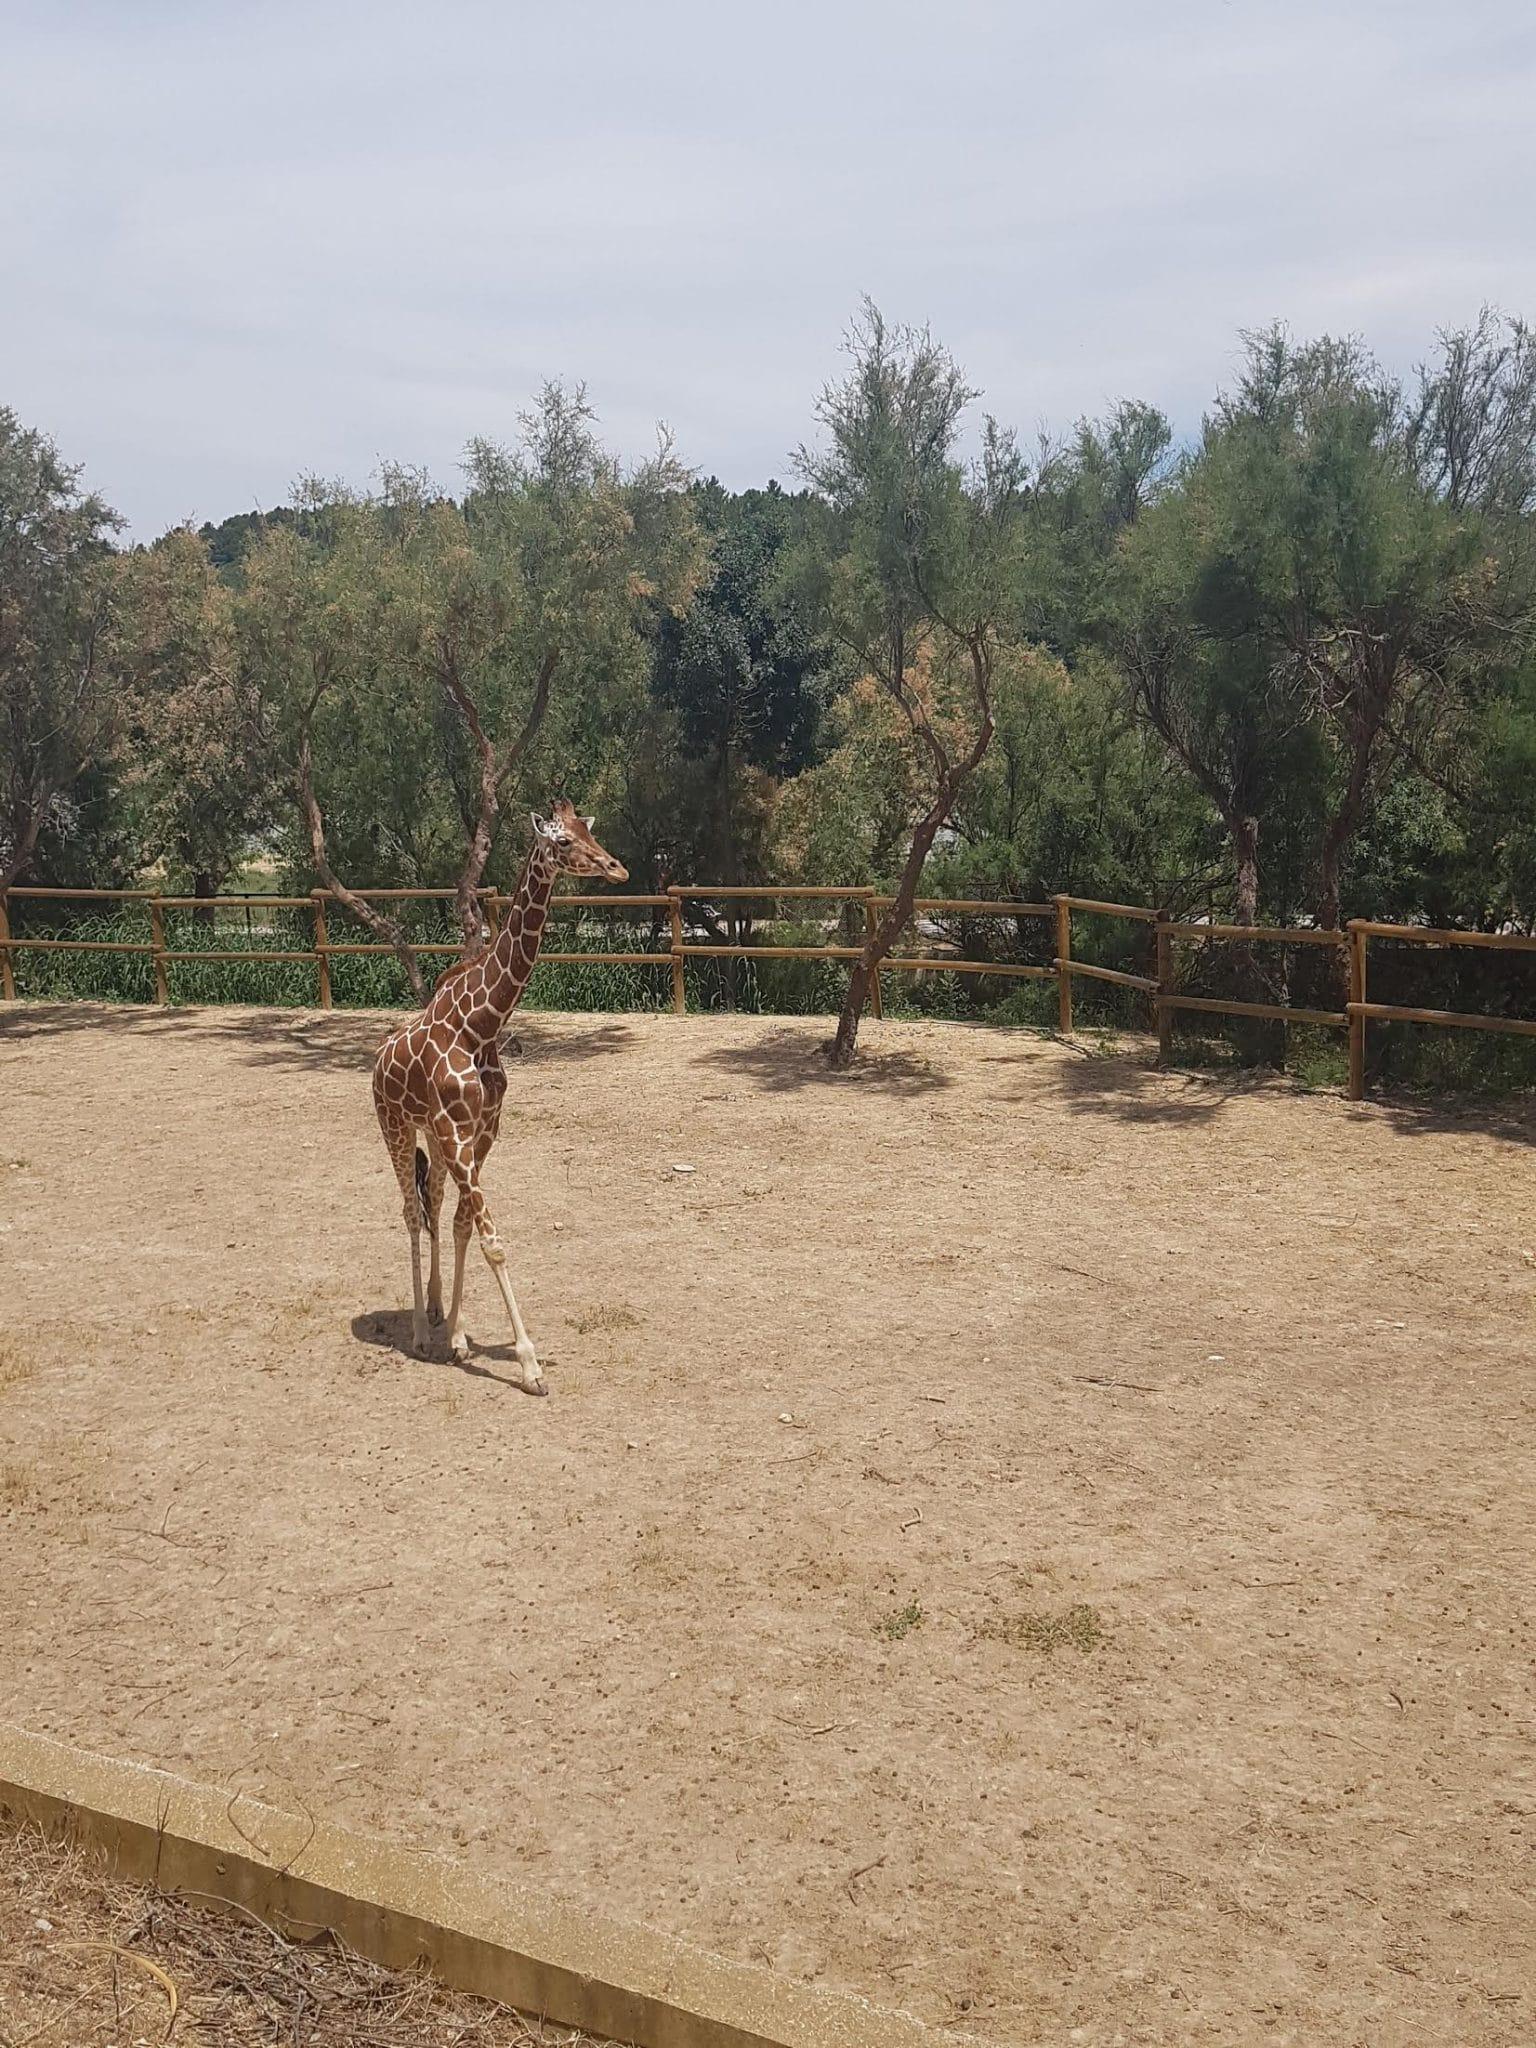 CONCOURS PHOTO 2020 ENFANT Ambre GAUTRON (6 ans) – Girafe réticulée